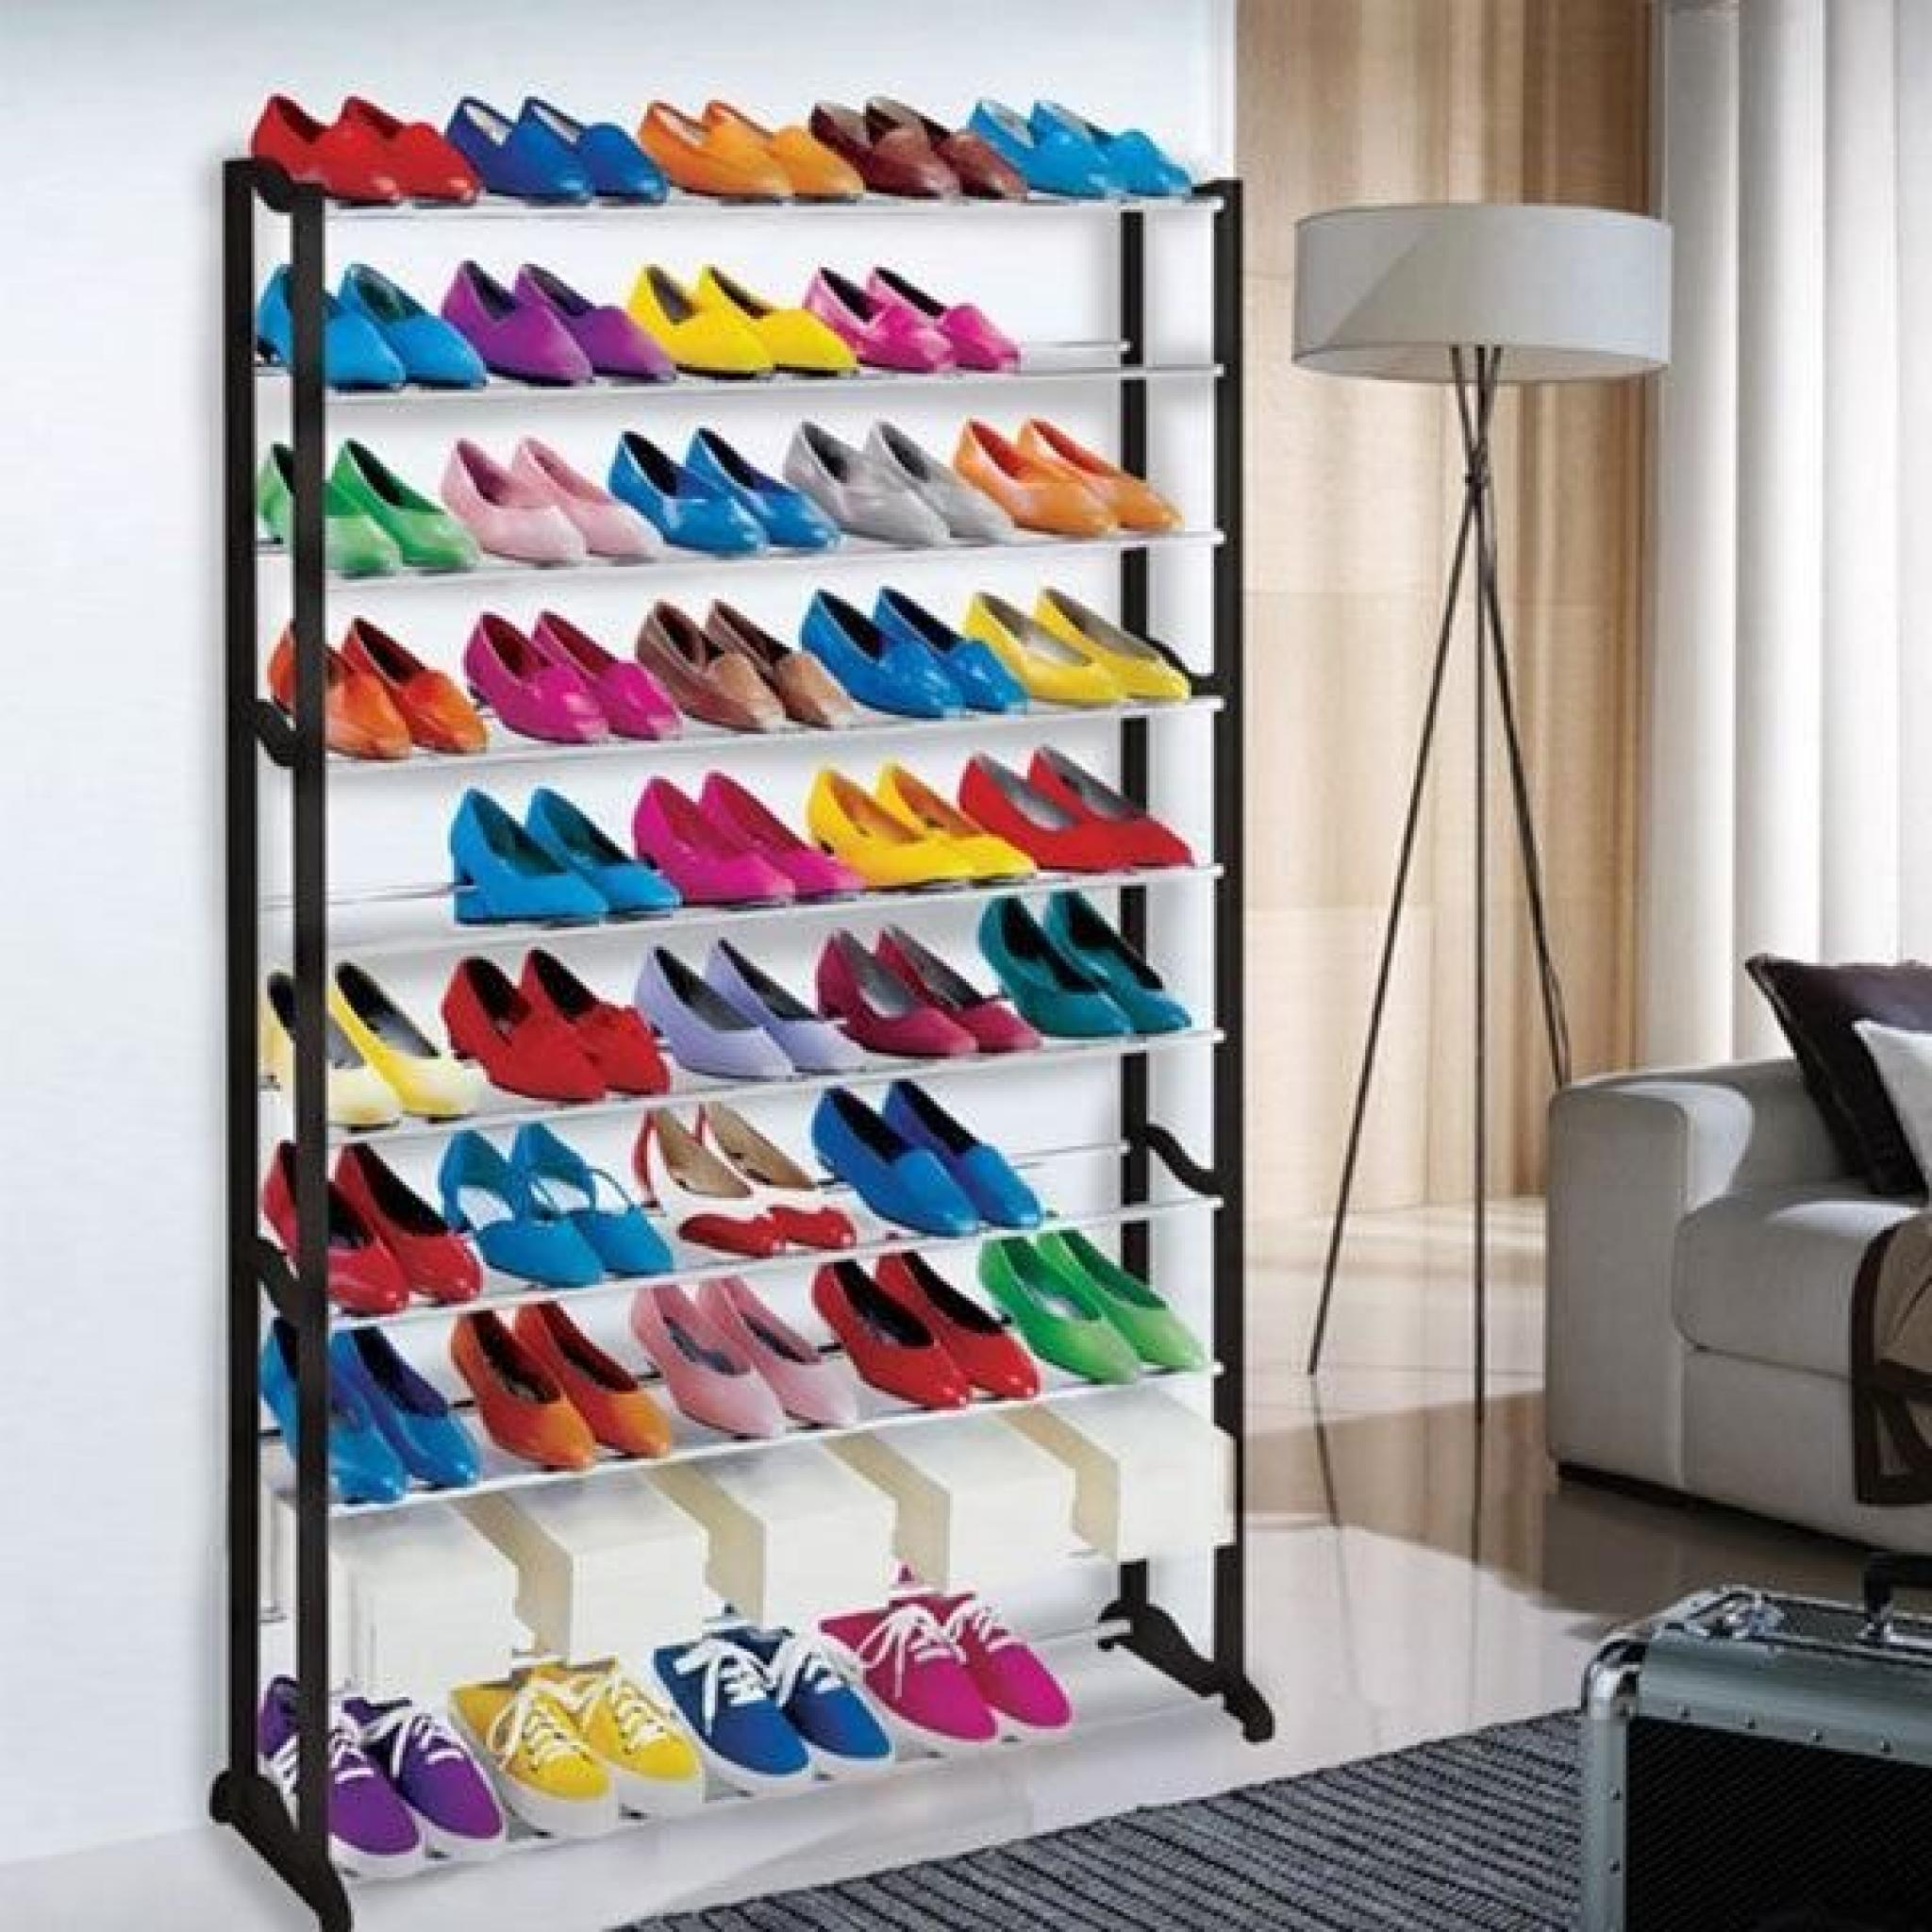 meuble organisateur range chaussures 50 paires tag re. Black Bedroom Furniture Sets. Home Design Ideas